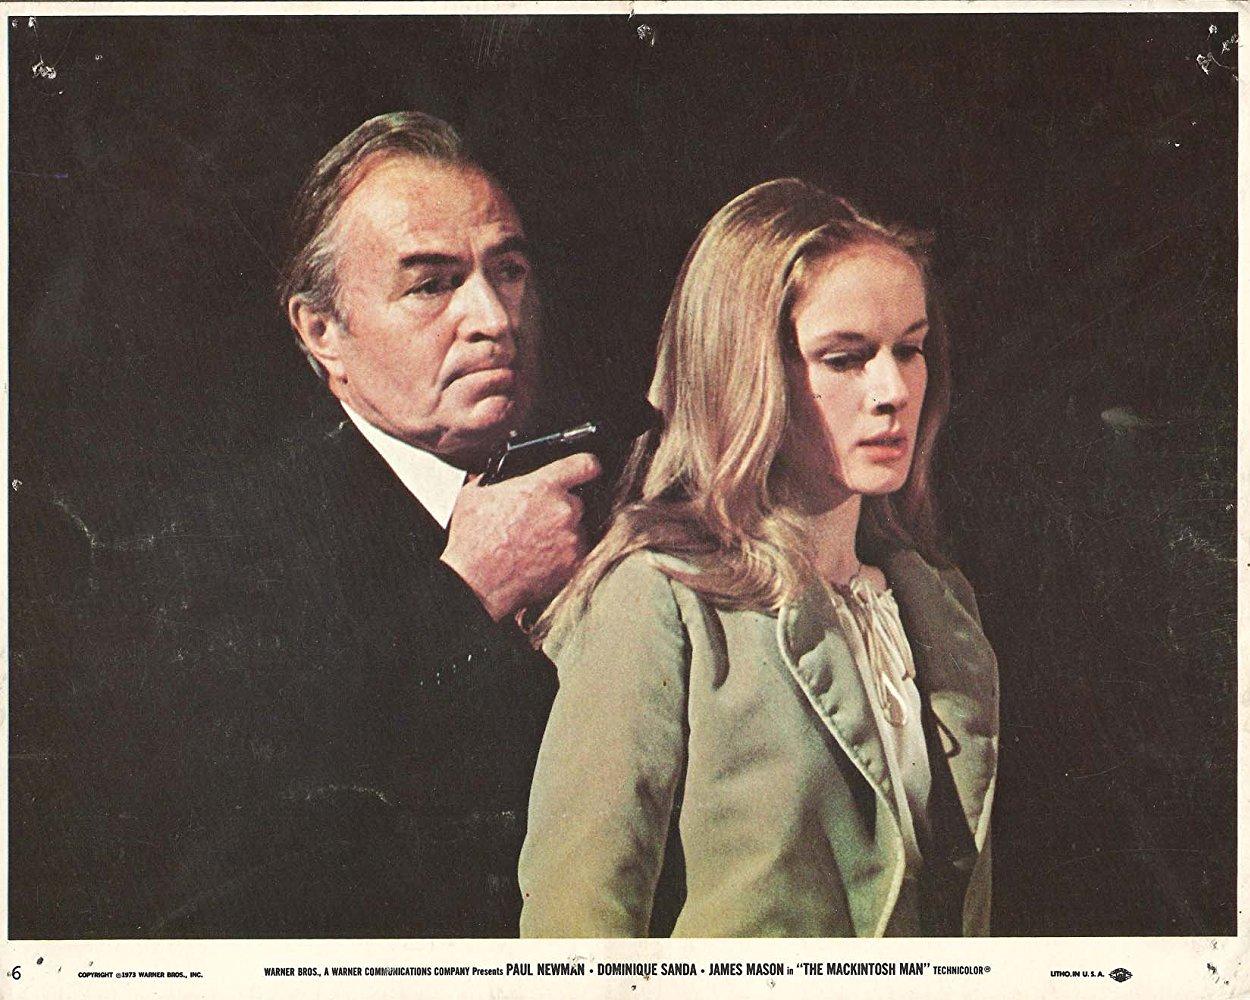 The Mackintosh Man  (1973).